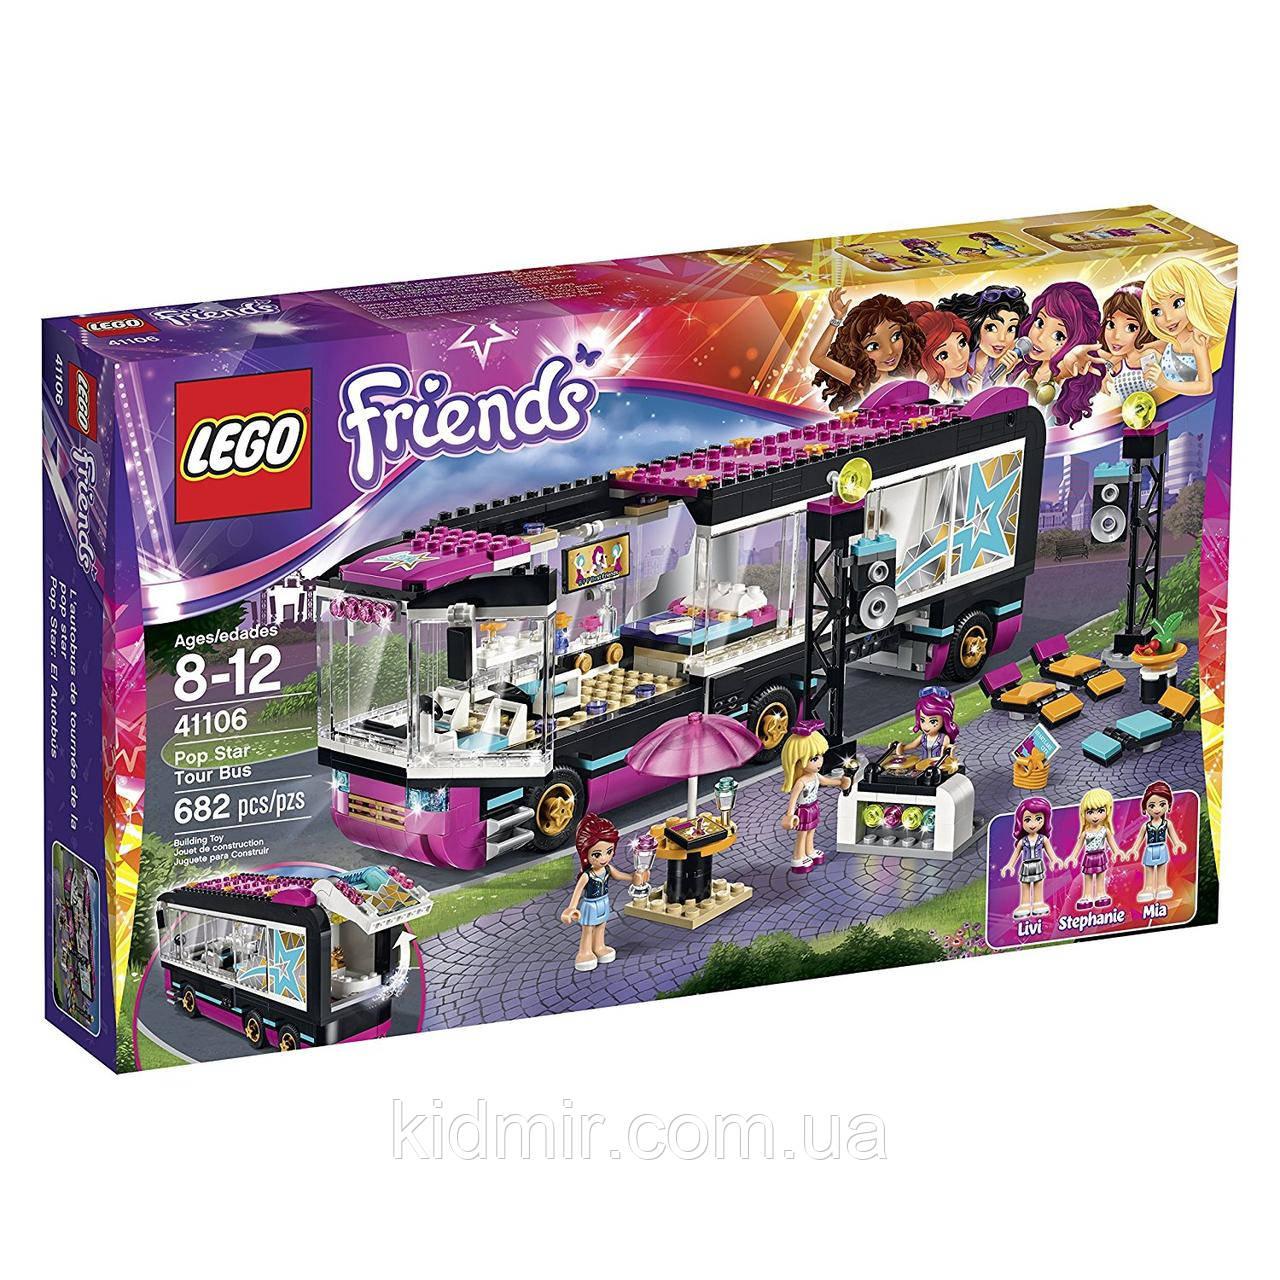 Конструктор Lego Friends 41106 Поп звезда: гастроли